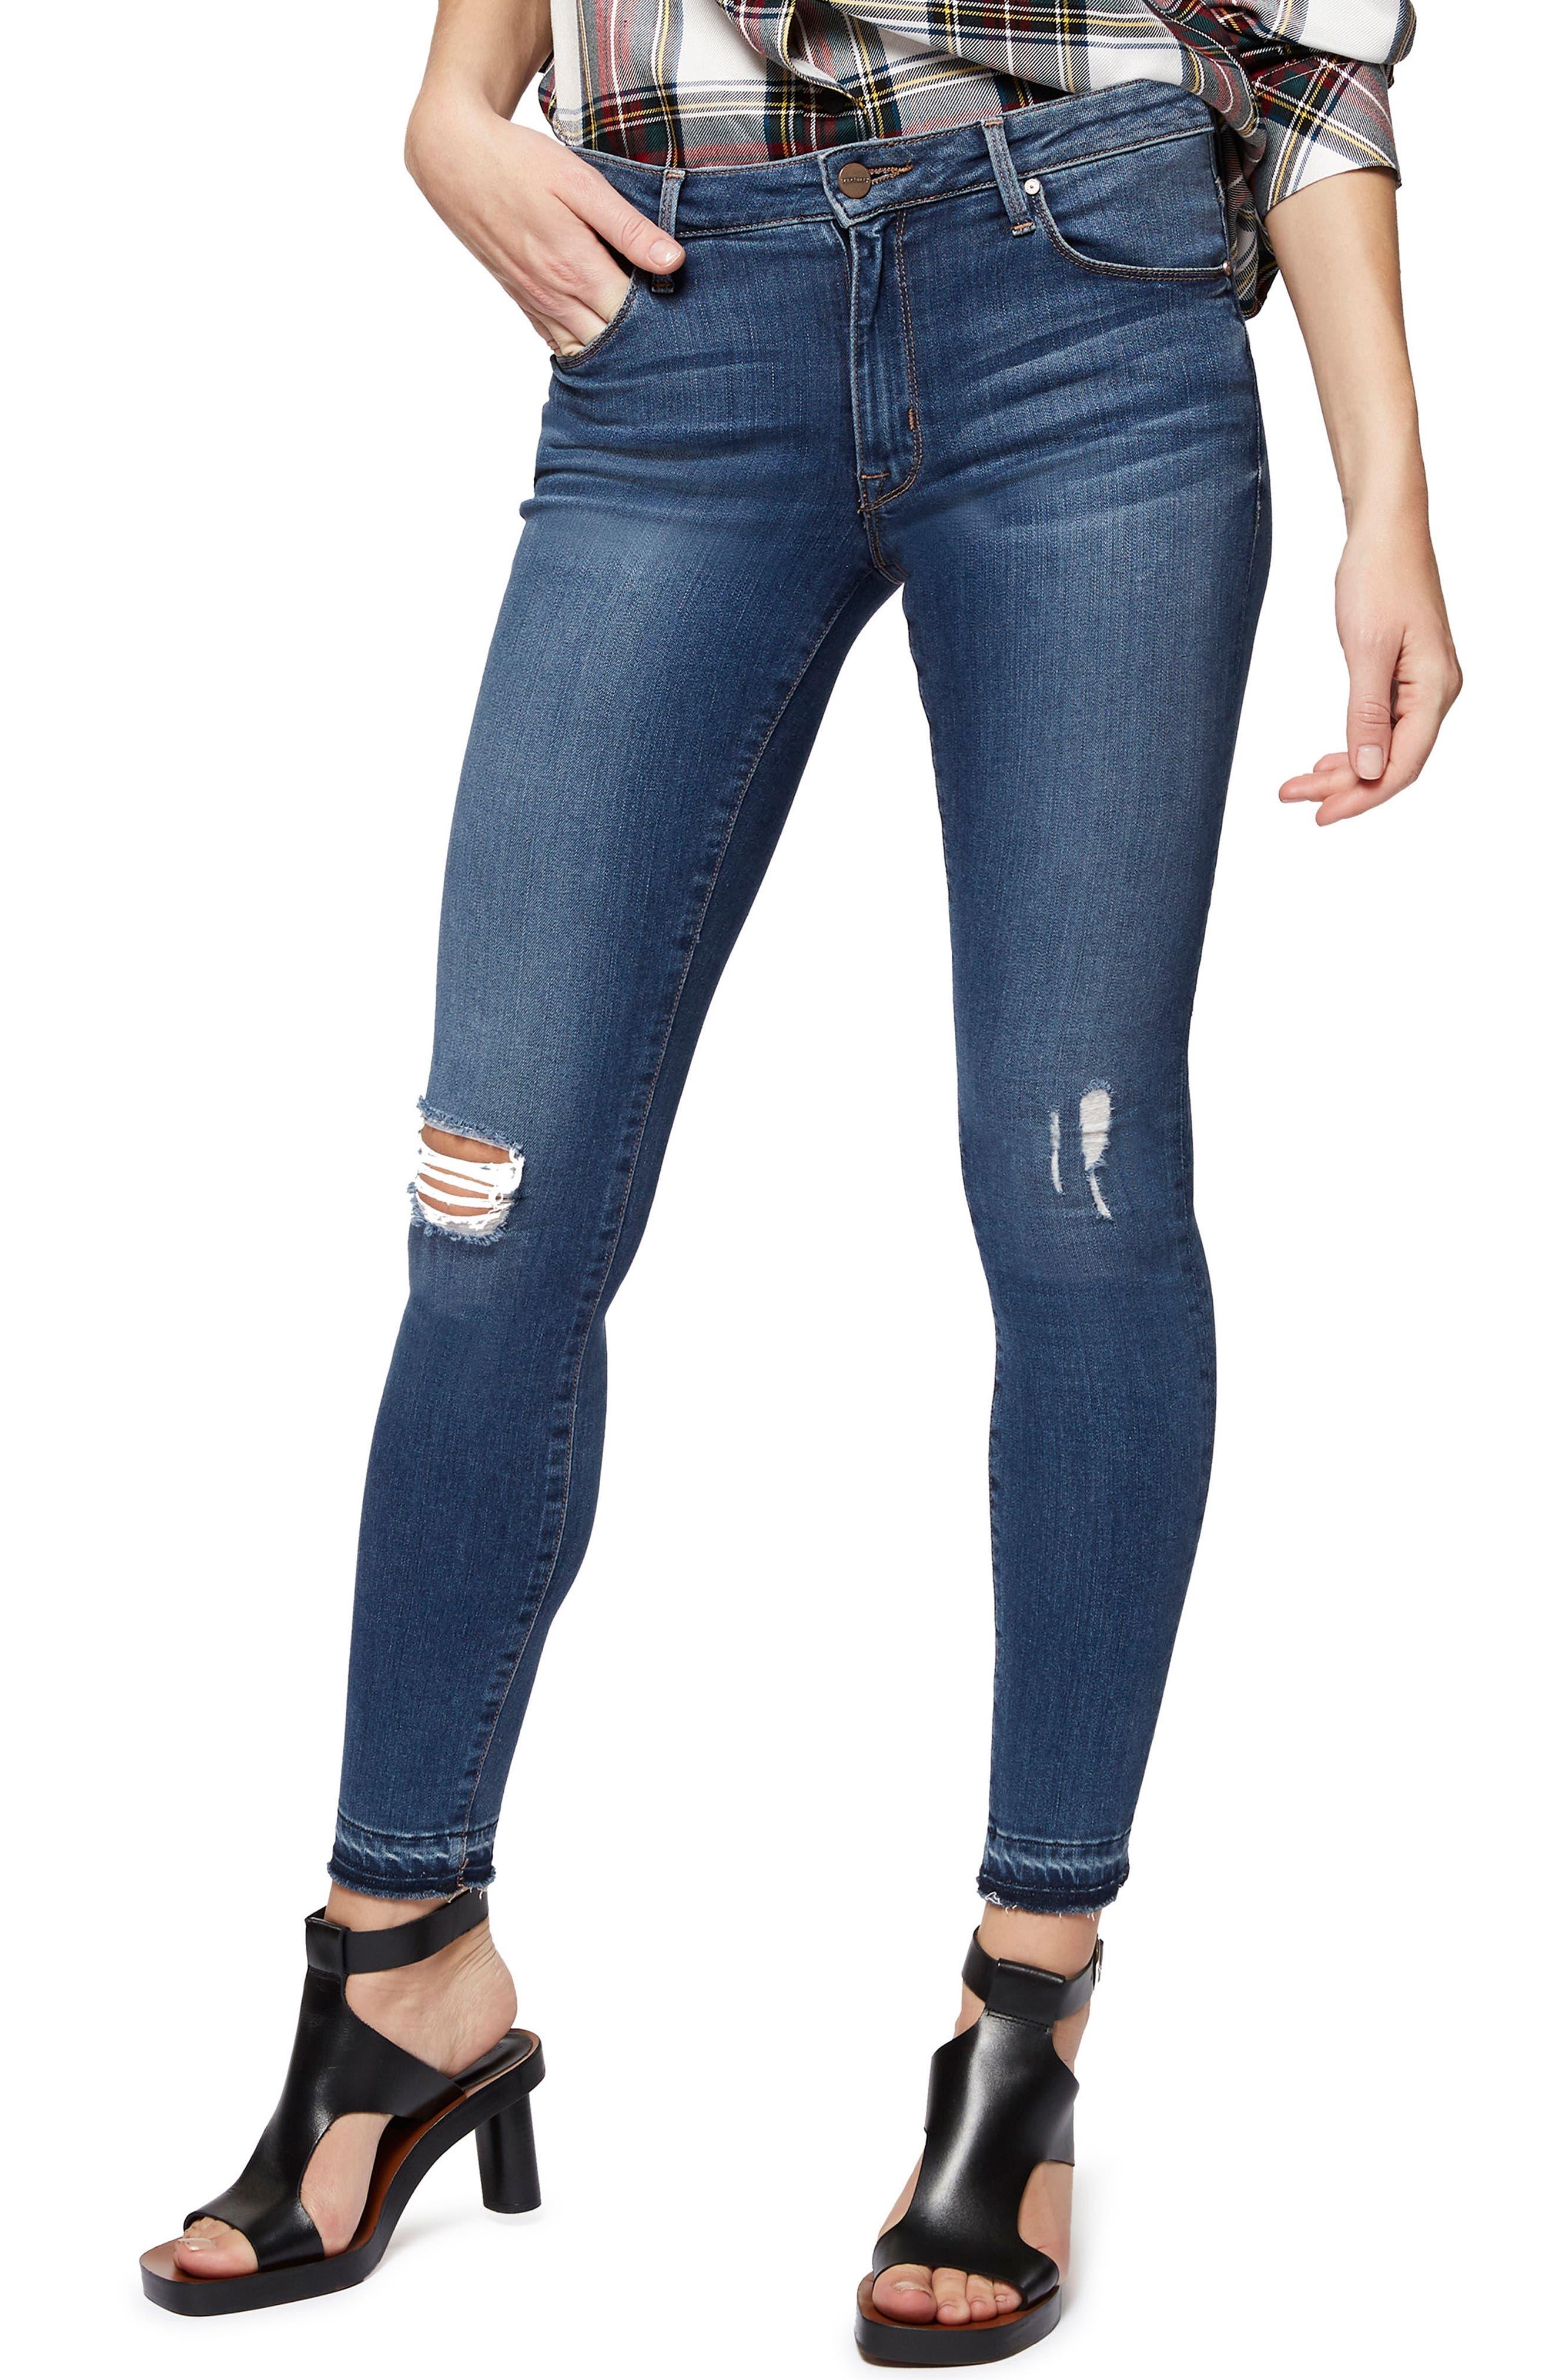 Main Image - Sanctuary Robbie High Waist Skinny Jeans (Amanda)